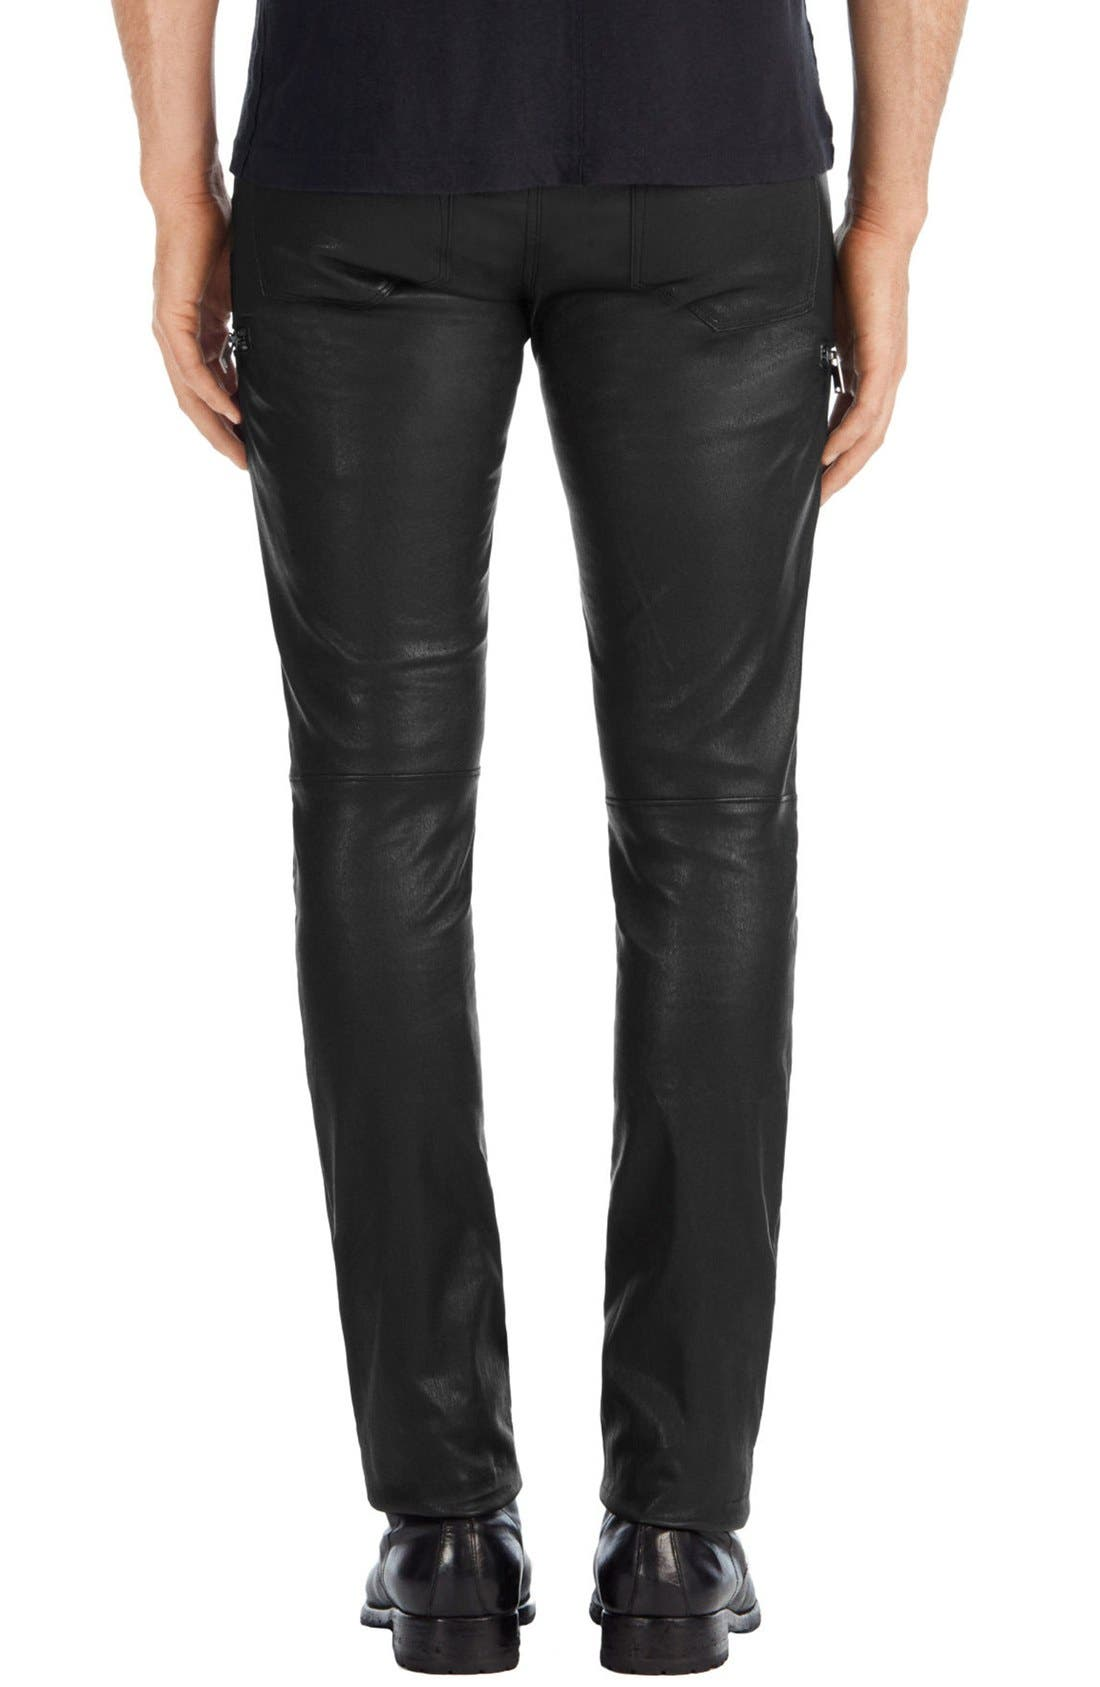 Acrux Skinny Fit Moto Leather Pants,                             Alternate thumbnail 2, color,                             Black